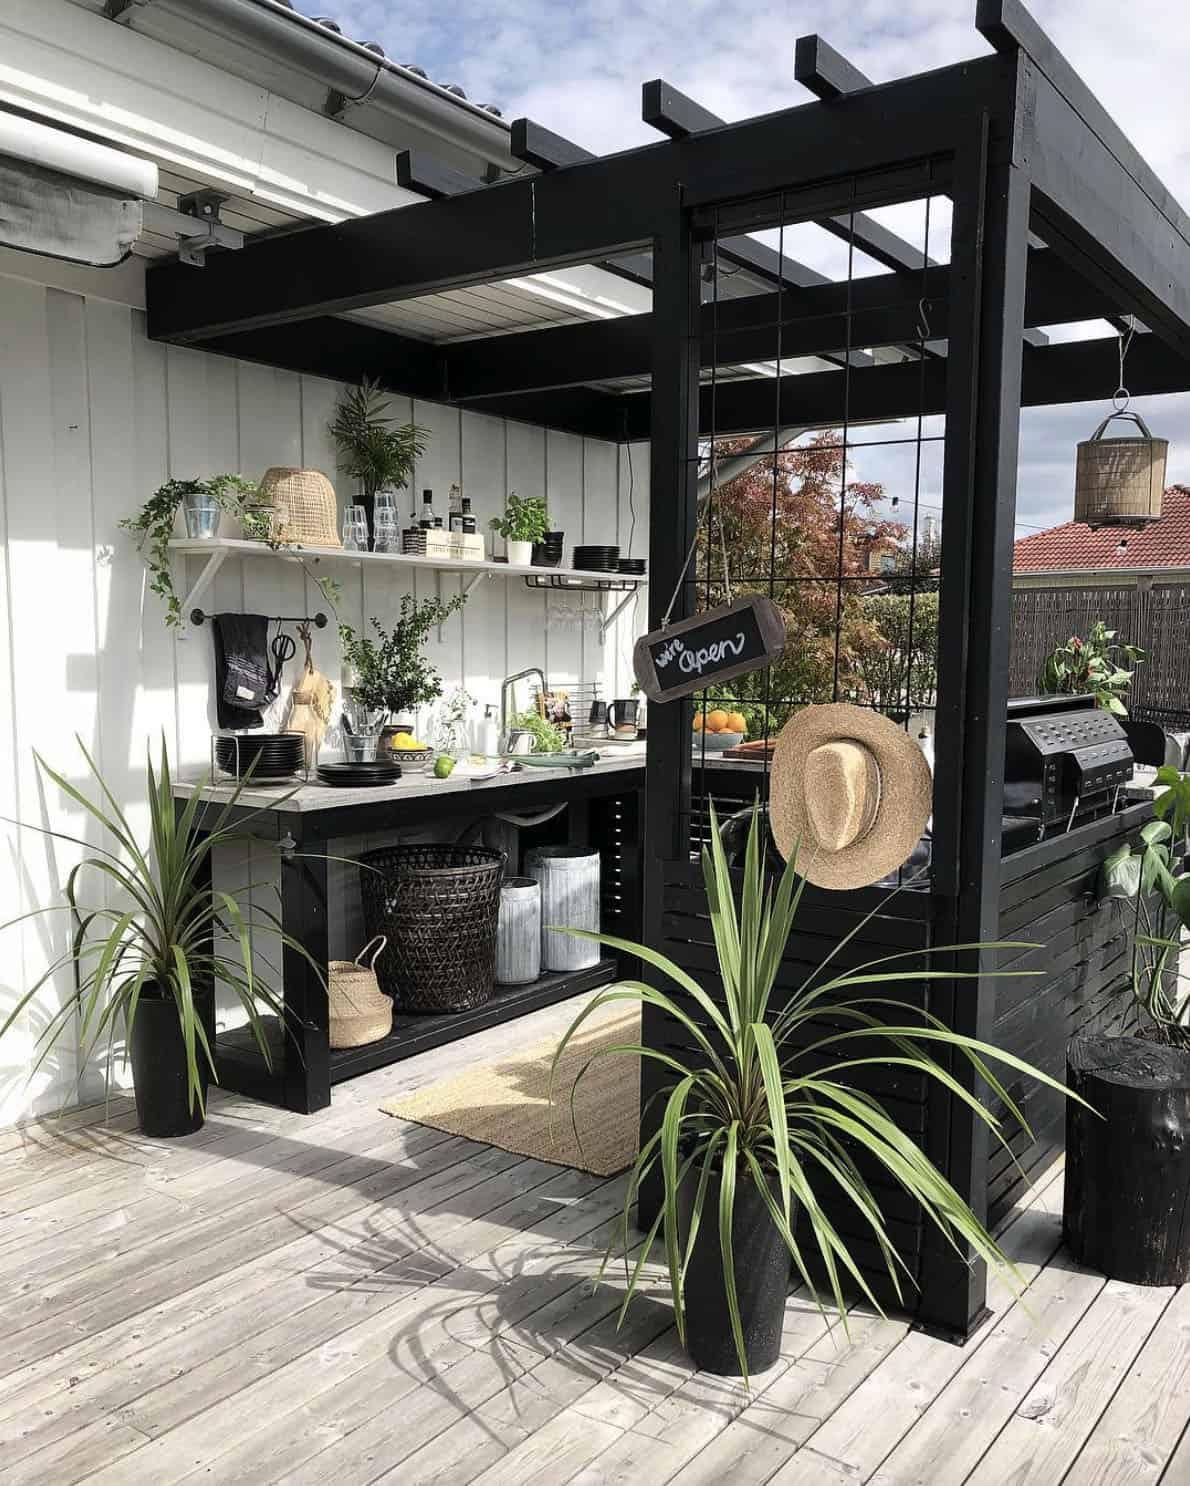 pergola-shading-an-outdoor-kitchen